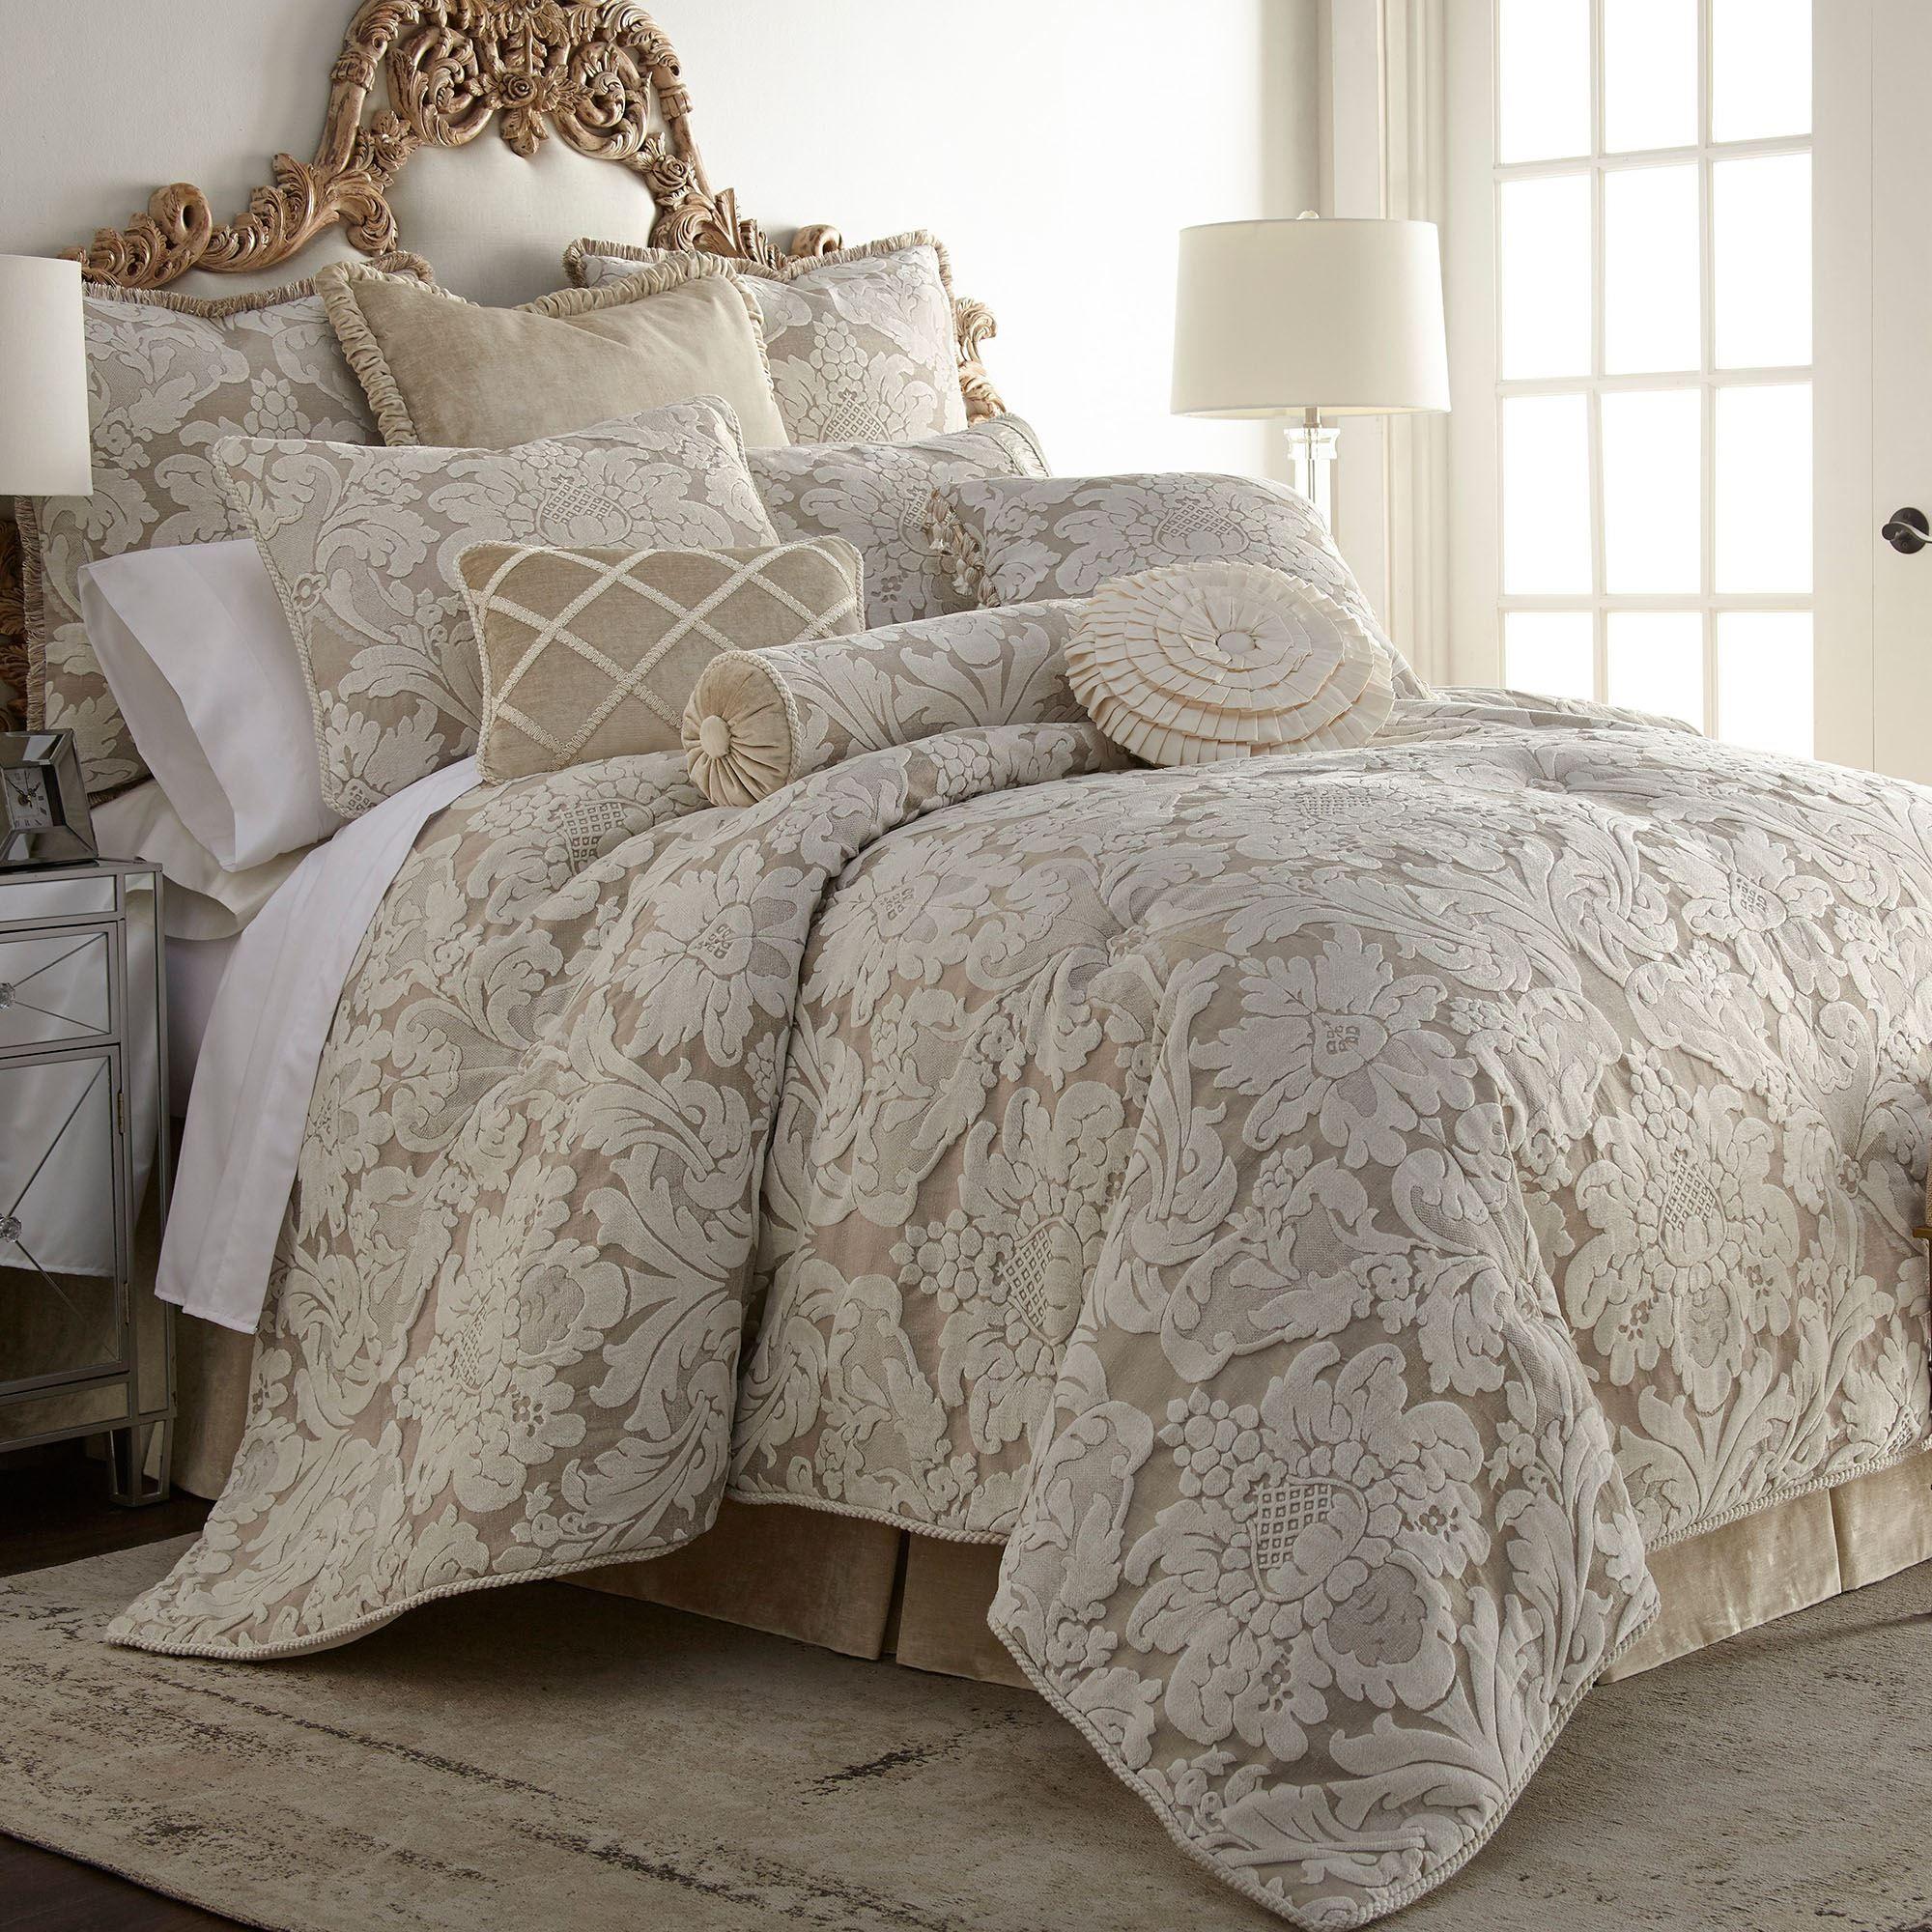 Brighton Damask Comforter Bedding by Austin Horn Classics